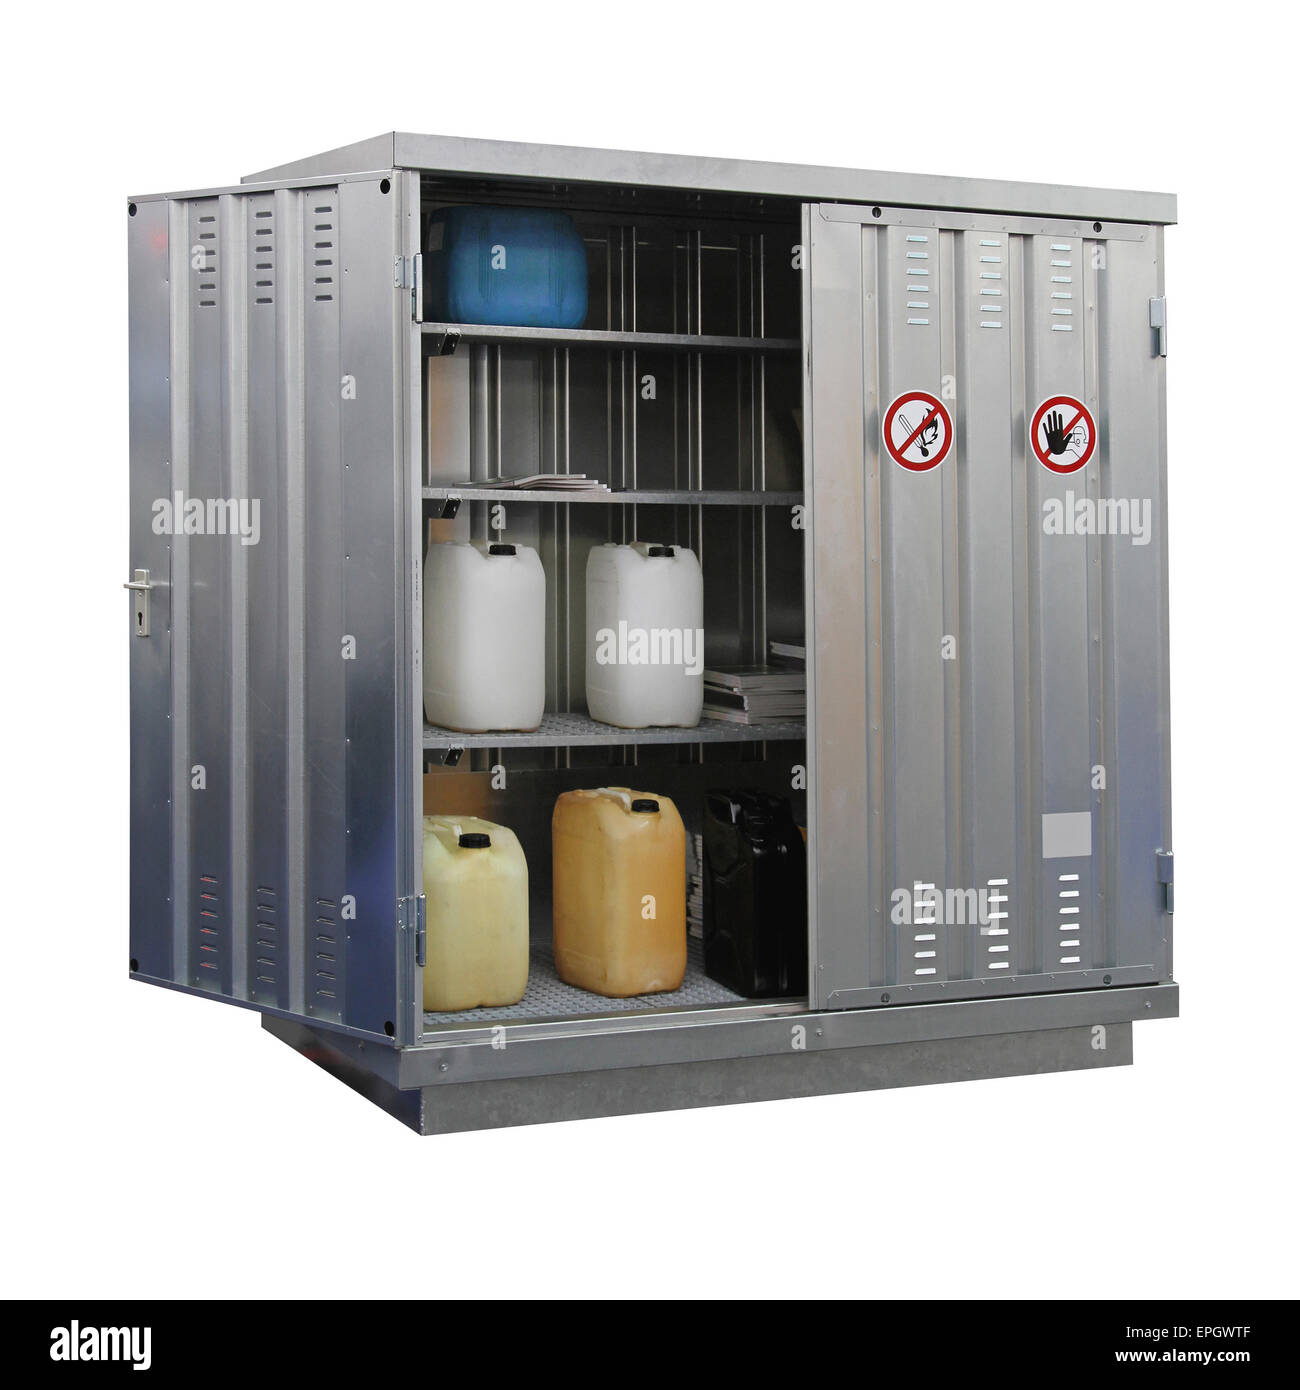 Hazardous materials storage - Stock Image